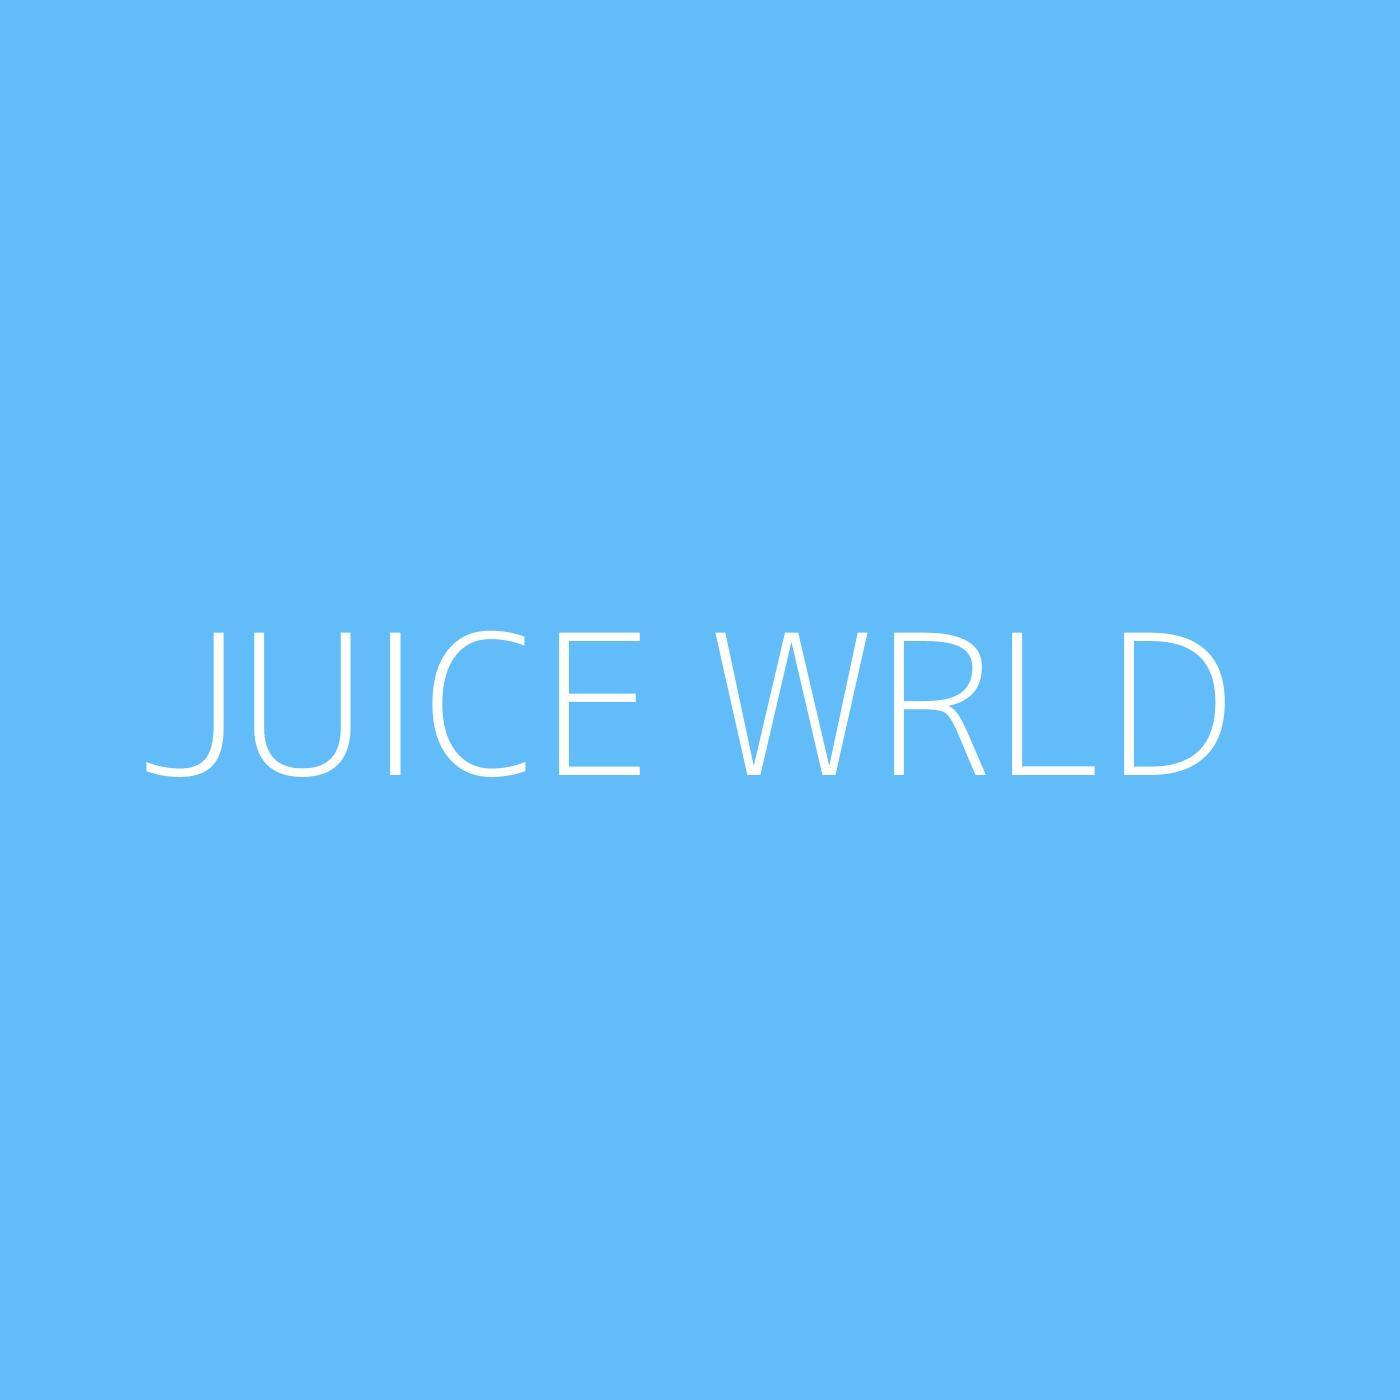 Juice WRLD Playlist Artwork